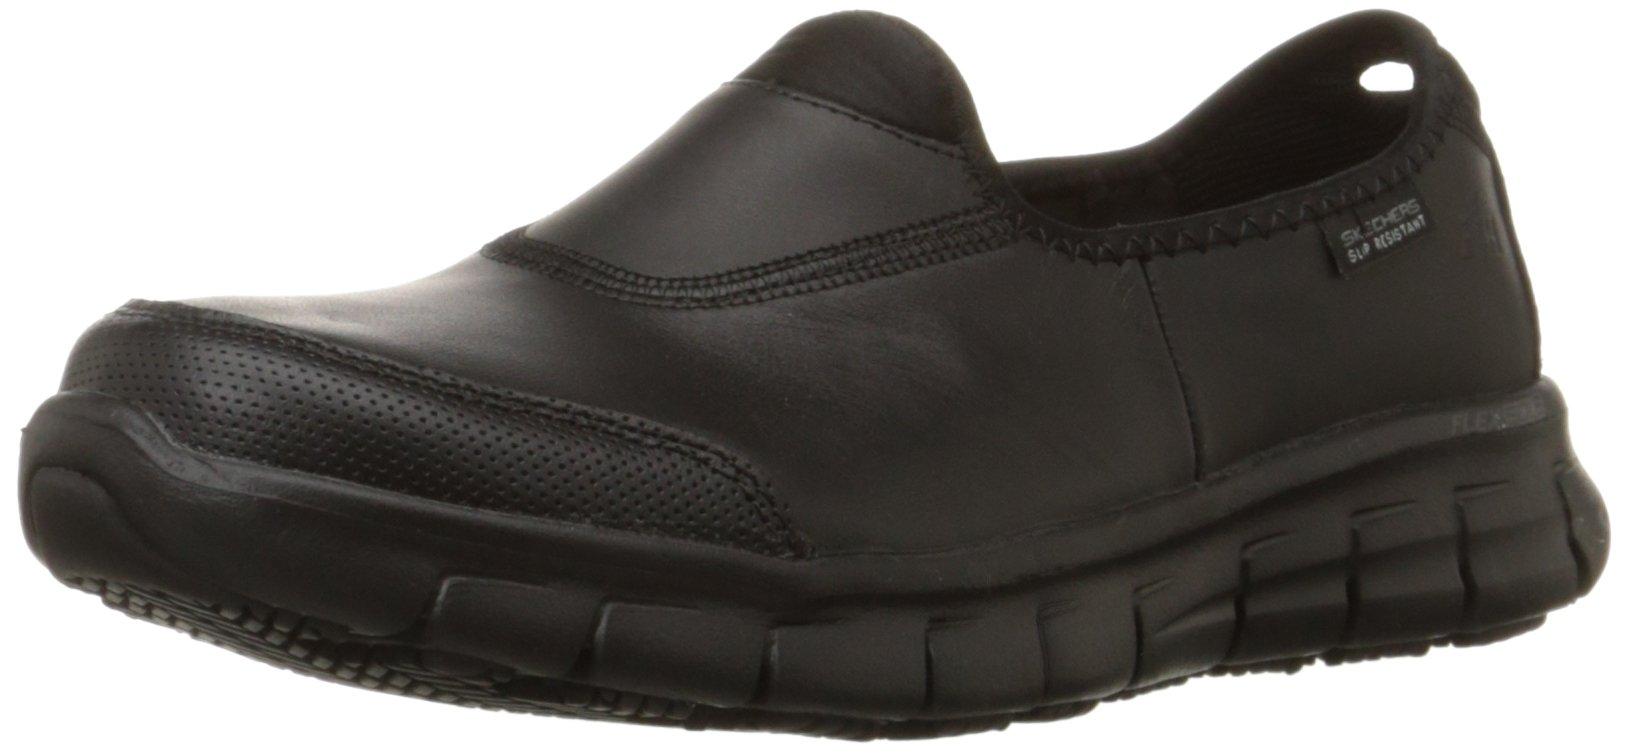 Skechers for Work Women's Sure Track Slip Resistant Shoe, Black, 8 M US